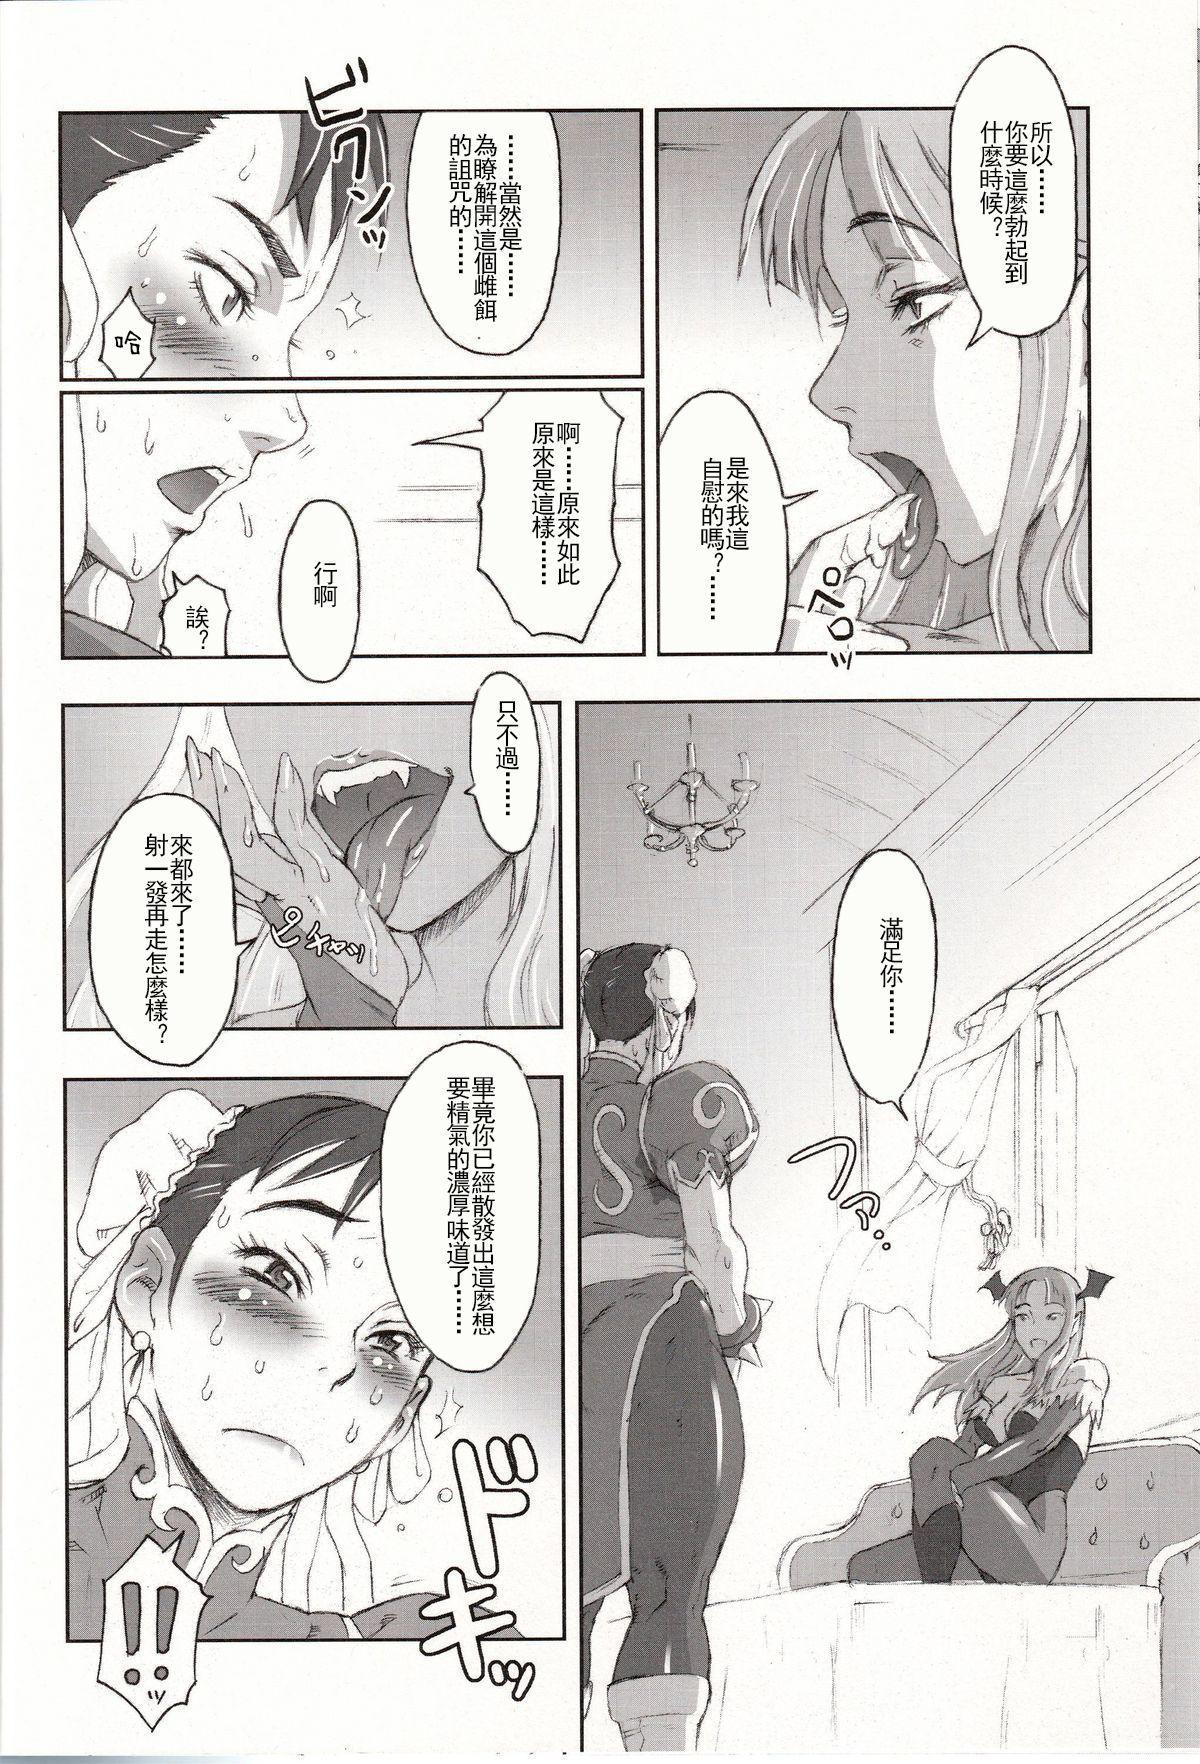 (C70) [Niku Ringo (Kakugari Kyoudai)] NIPPON Onna HEROINE 2 (Darkstalkers, Street Fighter II)[Chinese]【不可视汉化】 10